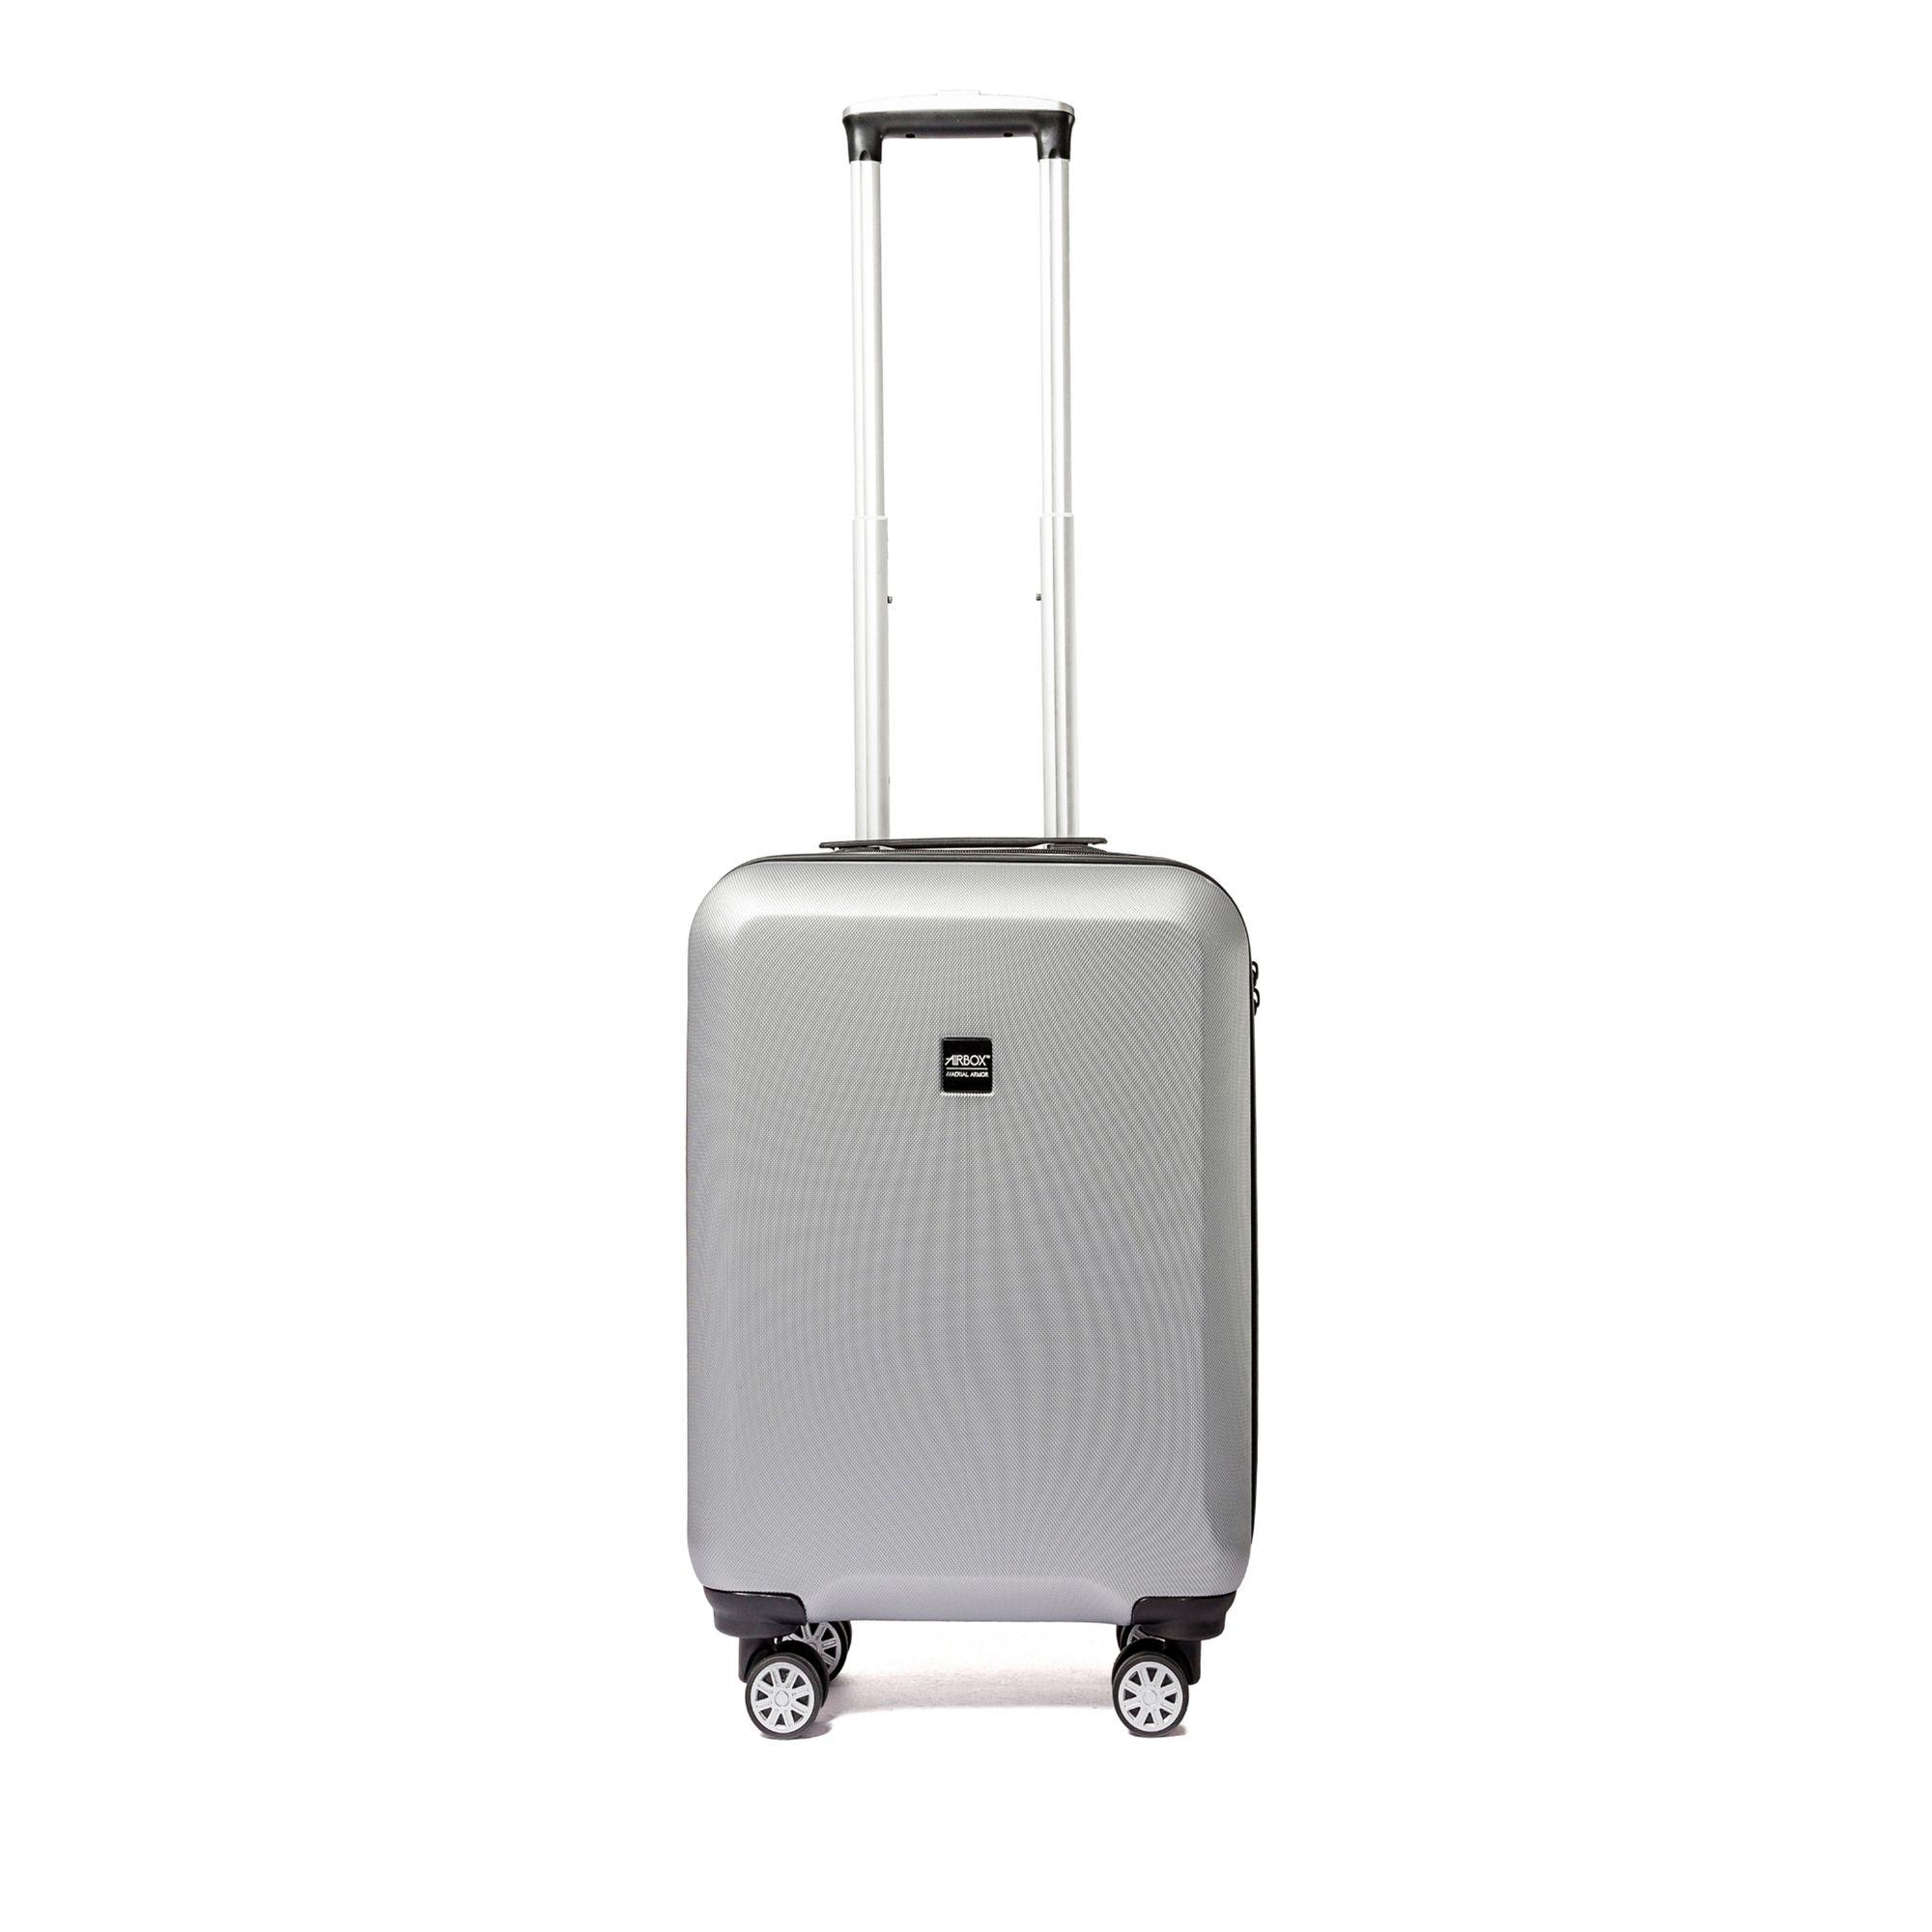 Bilde av Airbox Az8 Hard Koffert Med 4 Hjul, 55/65/75 Cm, Sølv, 55cm